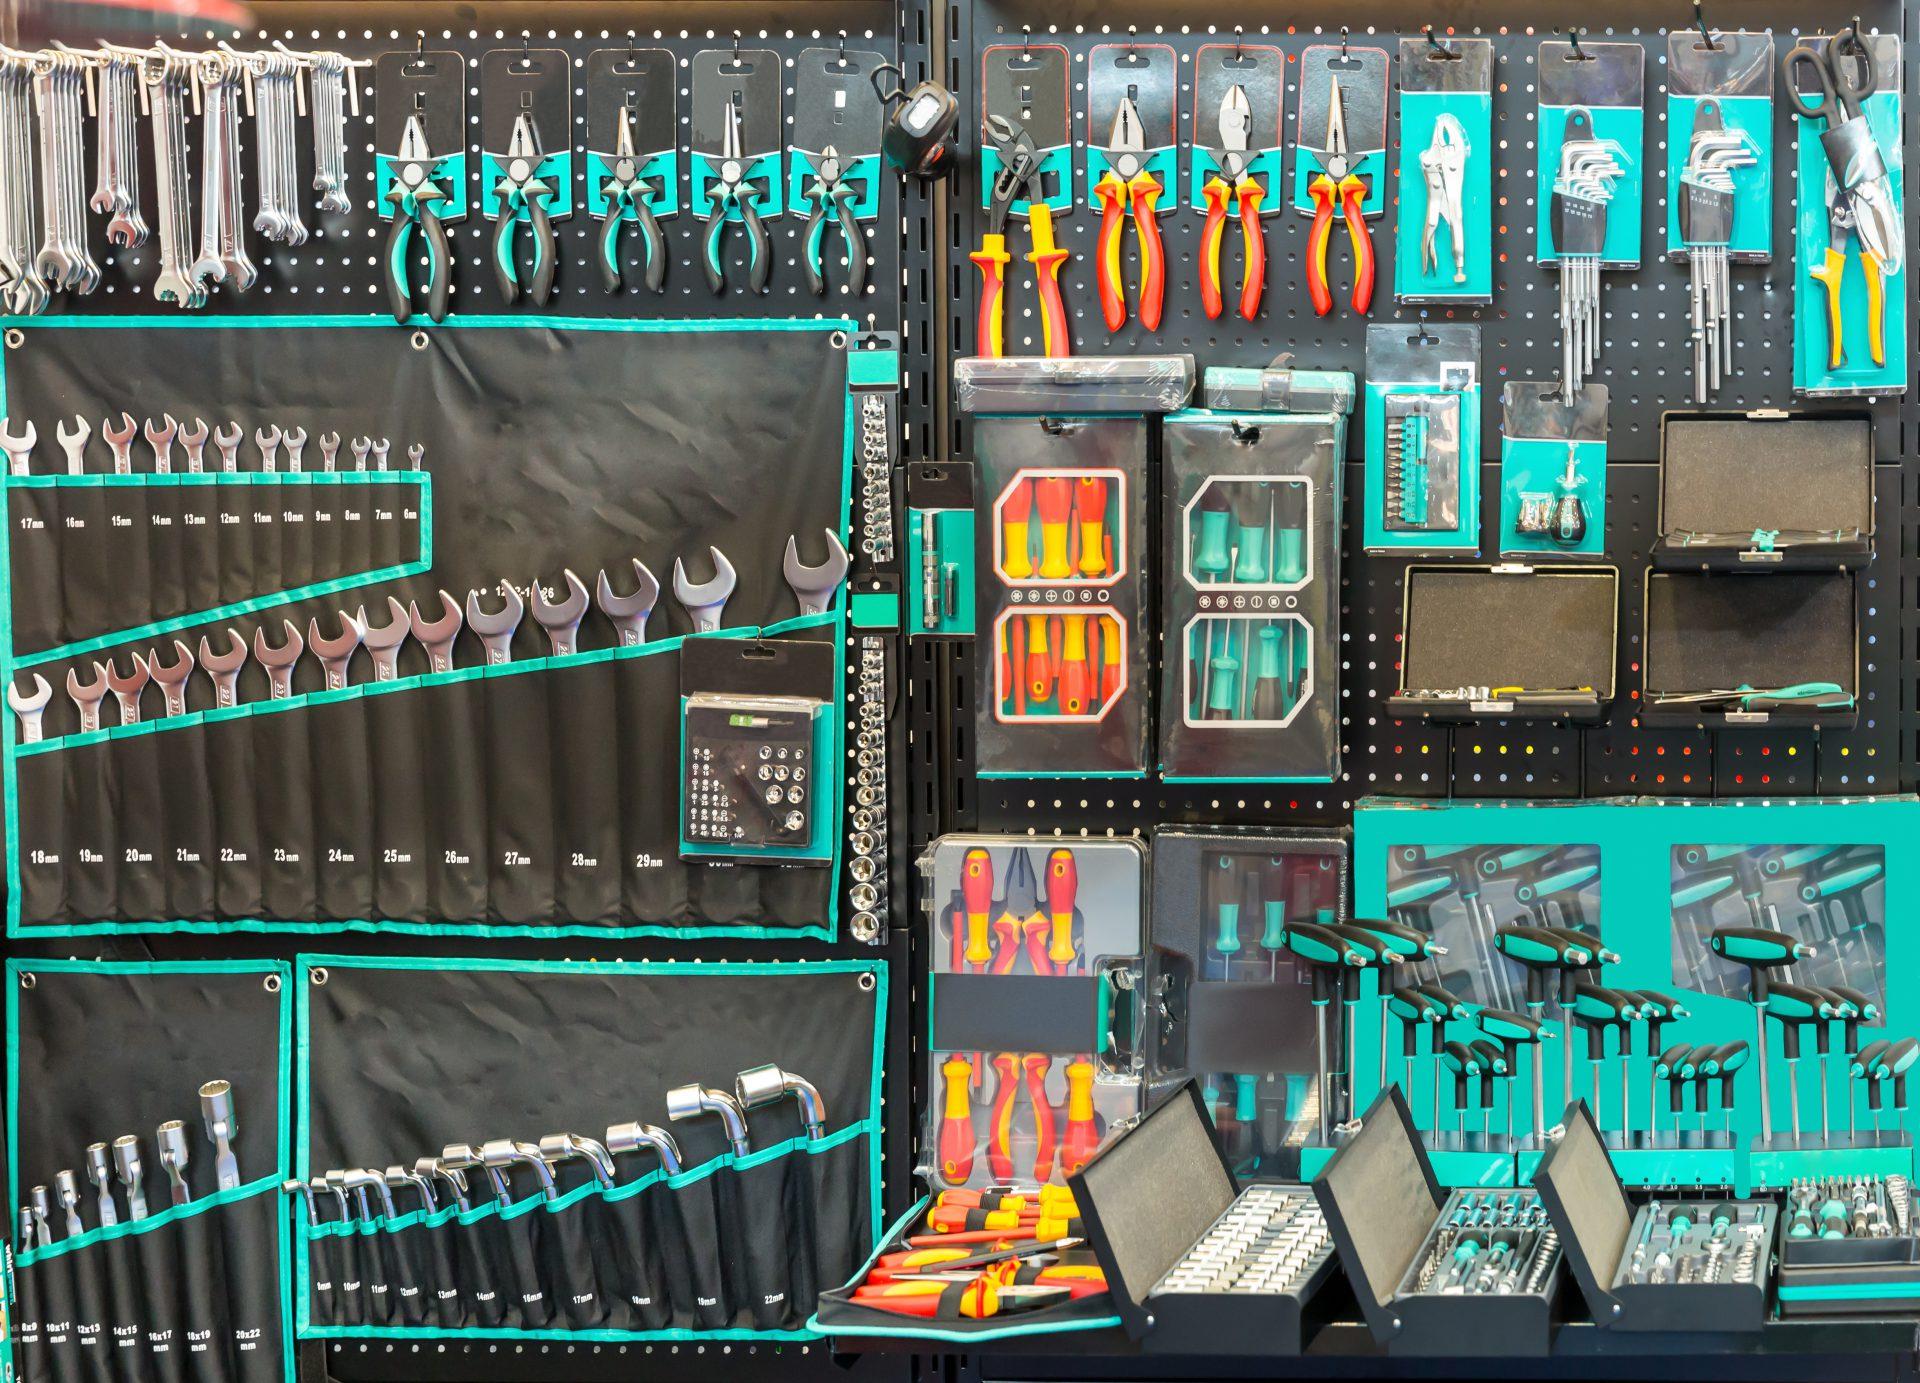 professional-workshop-equipment-special-tools-PDYAPEF